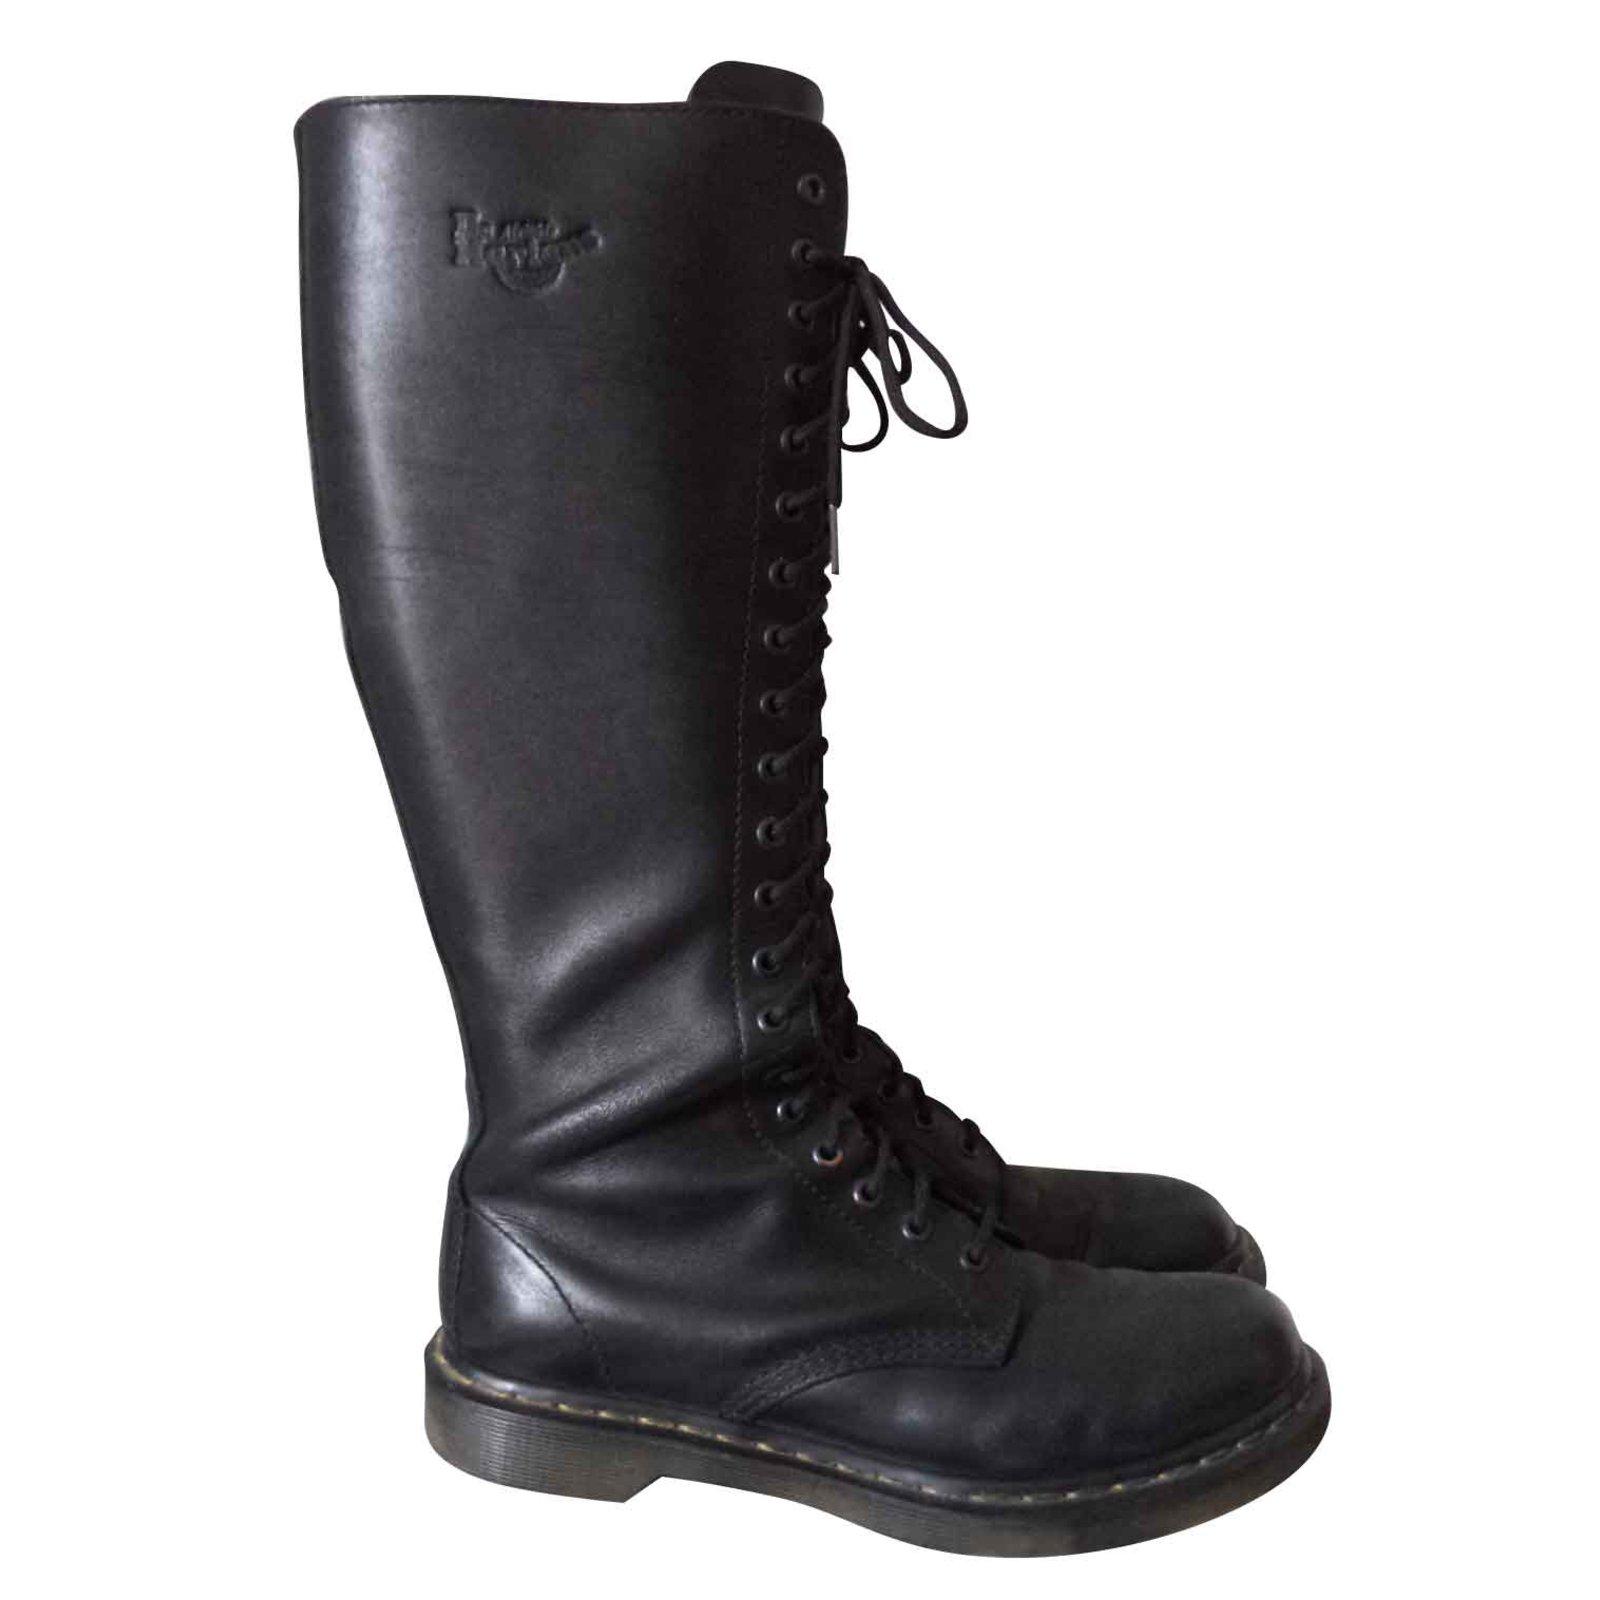 f0c2b2c9979 Dr. Martens Ranger Boots Boots Leather Black ref.102007 - Joli Closet